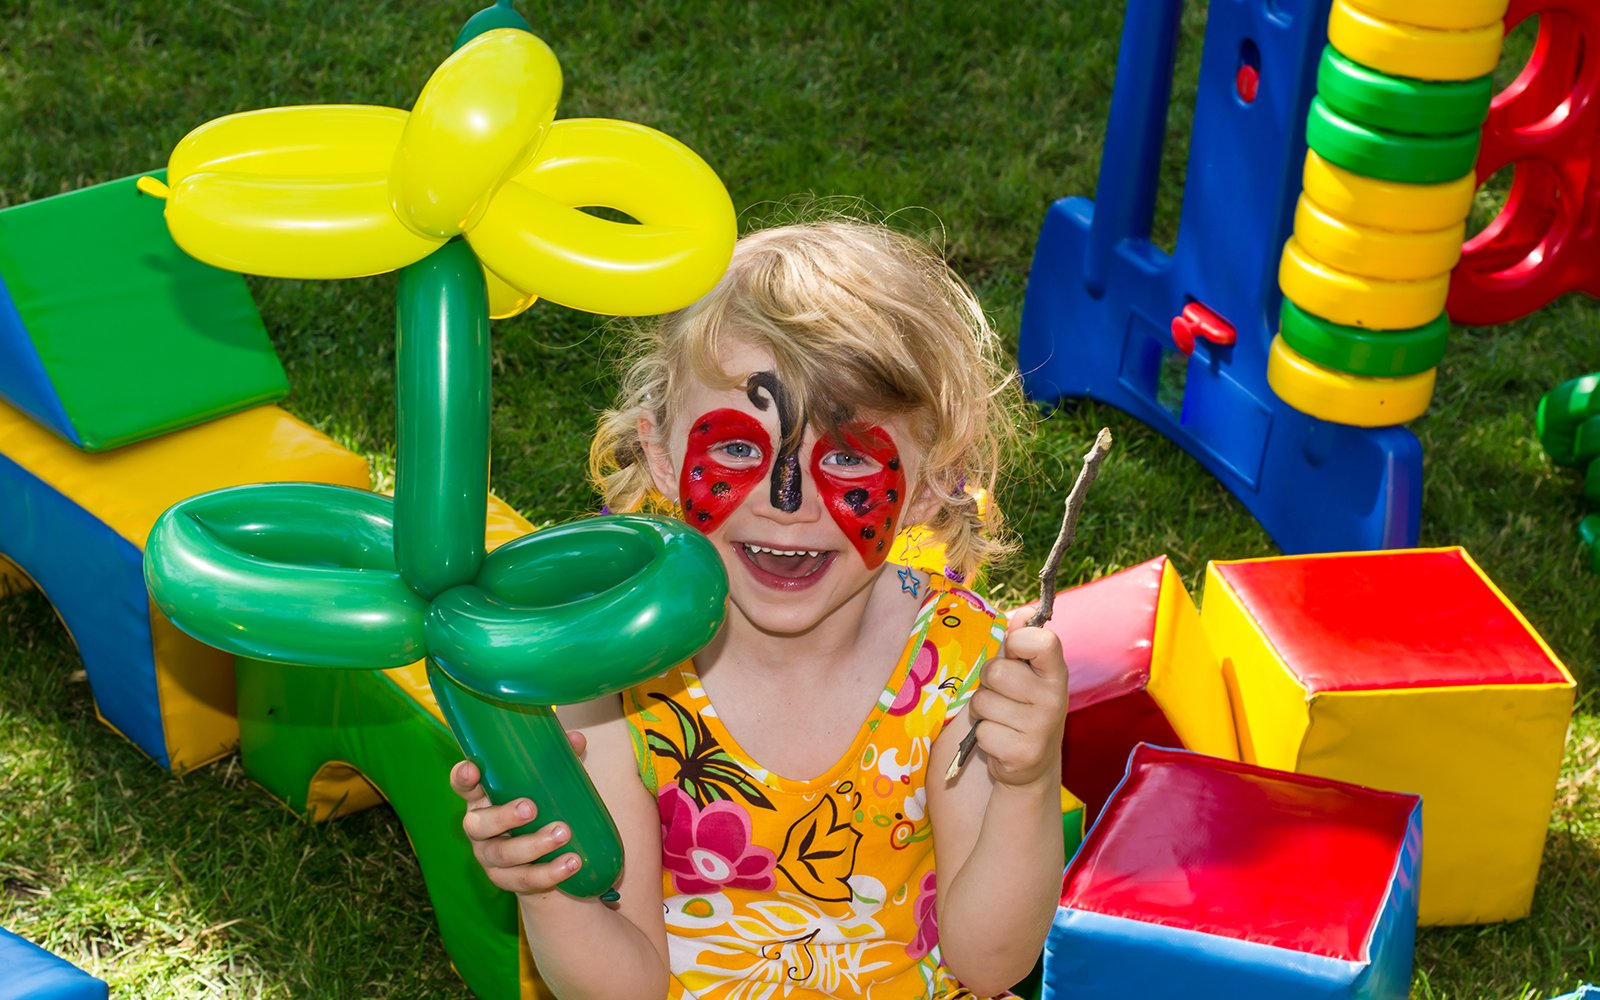 Bambina con pittura a faccia